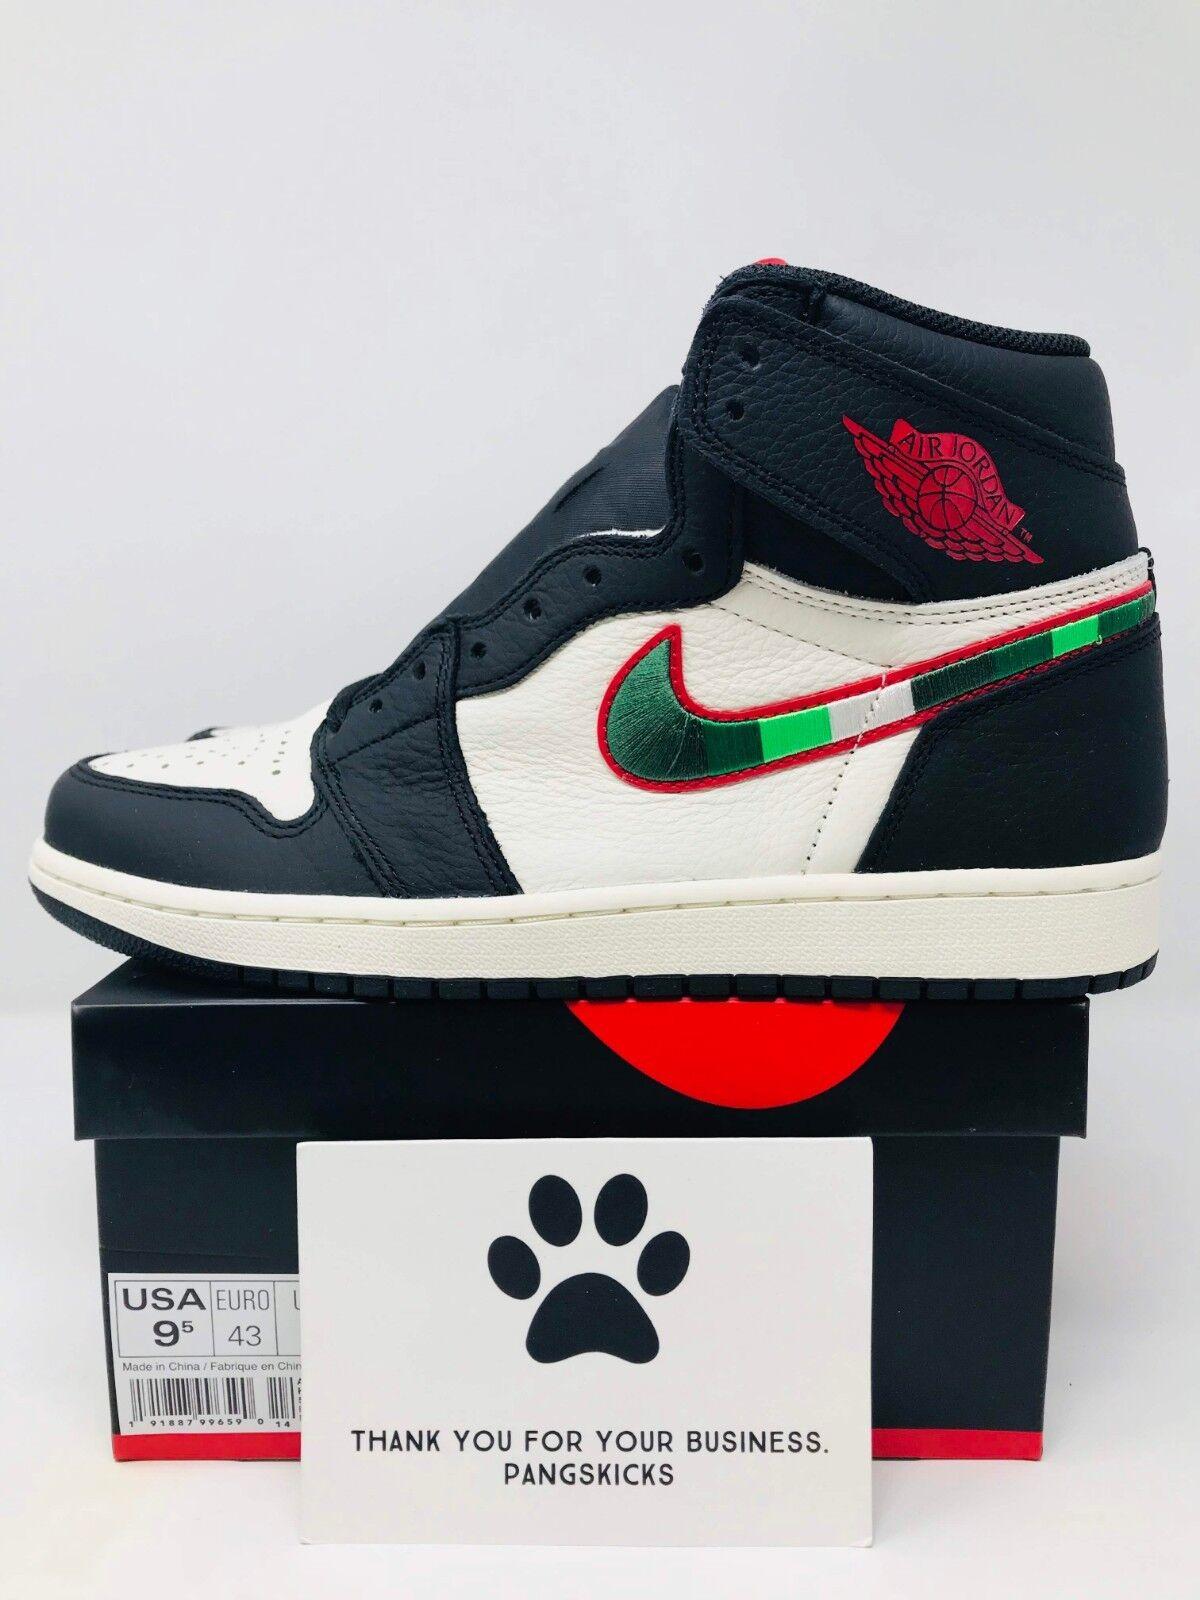 Nike Air Jordan 1 Retro High OG 'A Star Is Born' 555088-015 Size 9.5-11.5